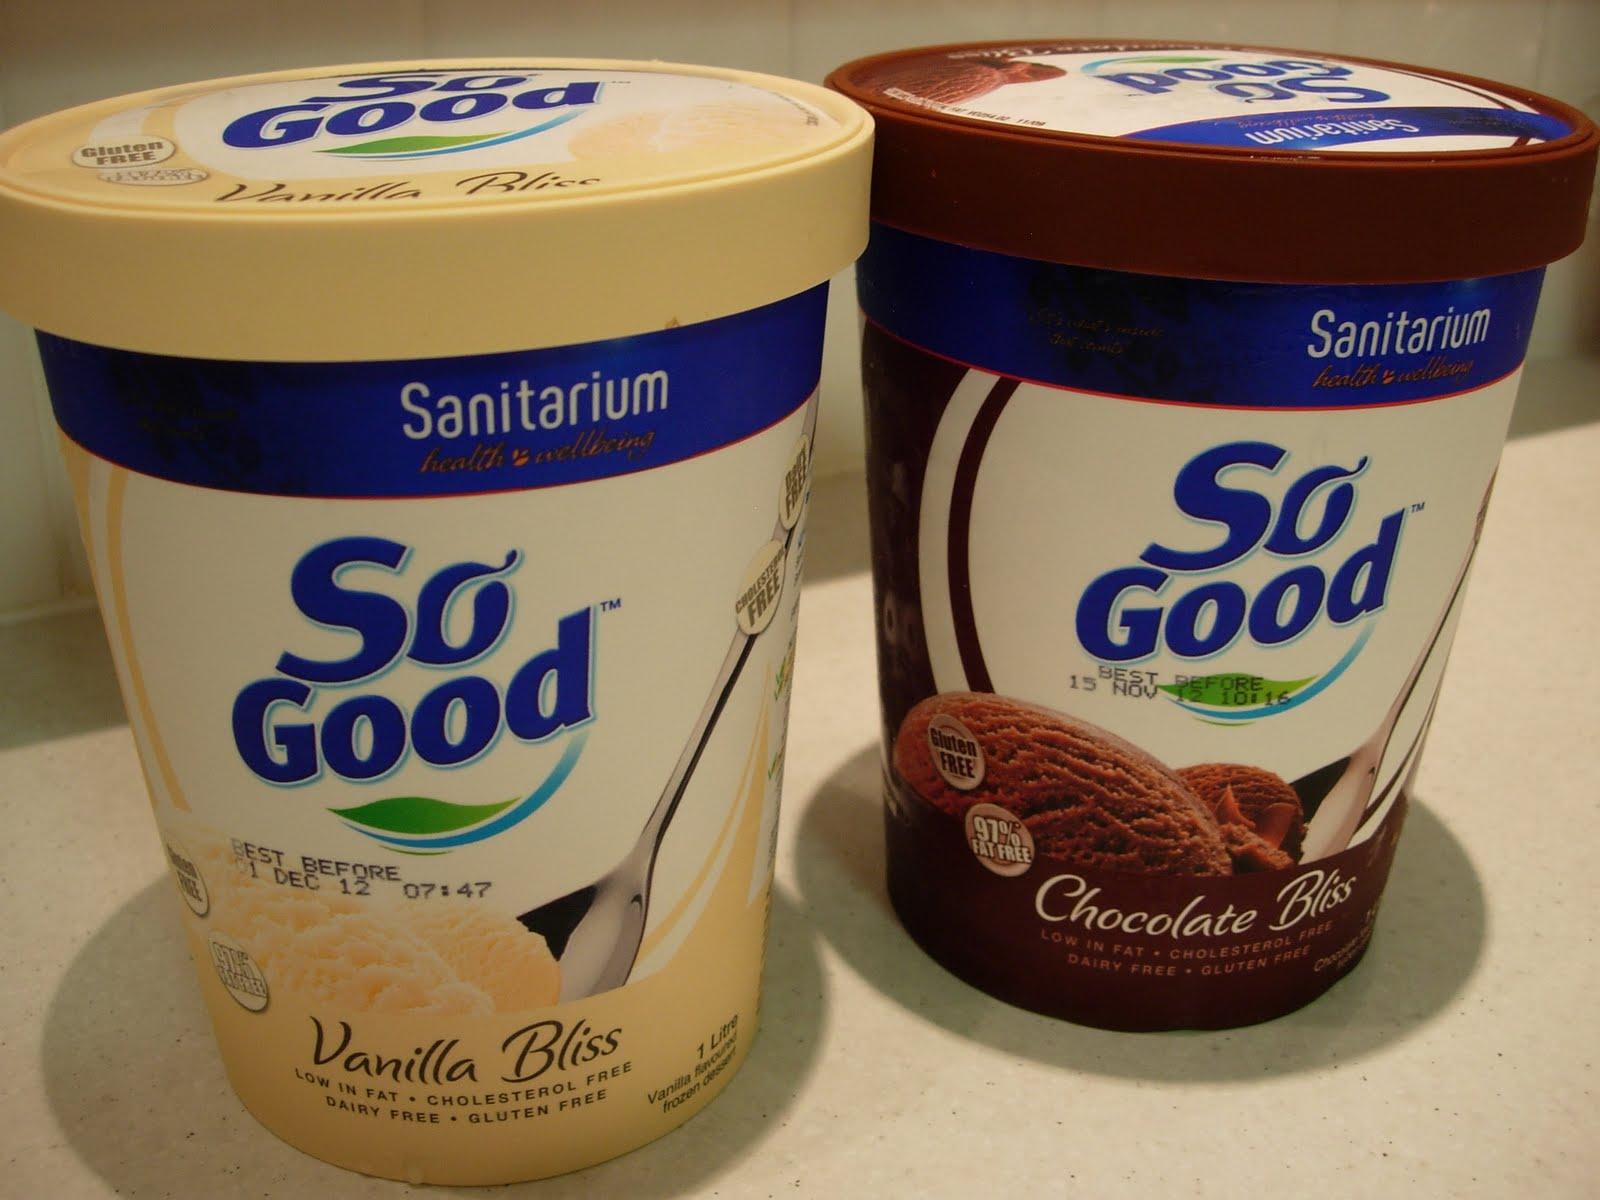 Gluten Free Ice Cream Cones And Cakes In Russia